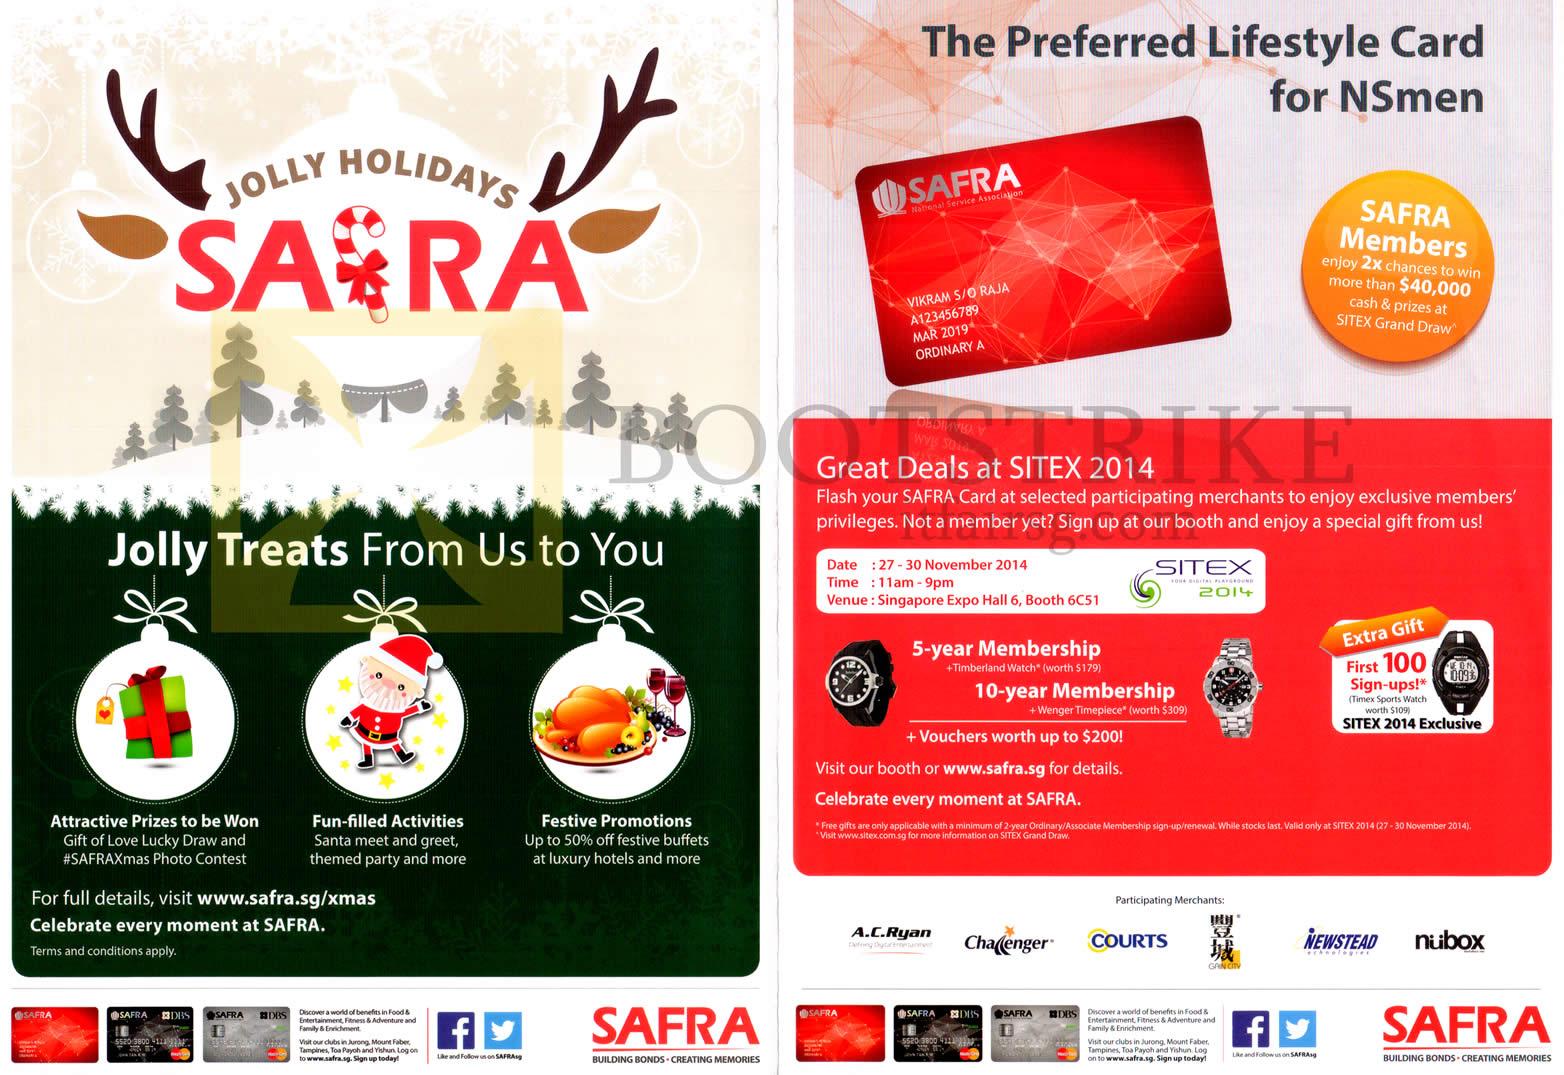 SITEX 2014 price list image brochure of Safra Card Treats, Membership Gifts